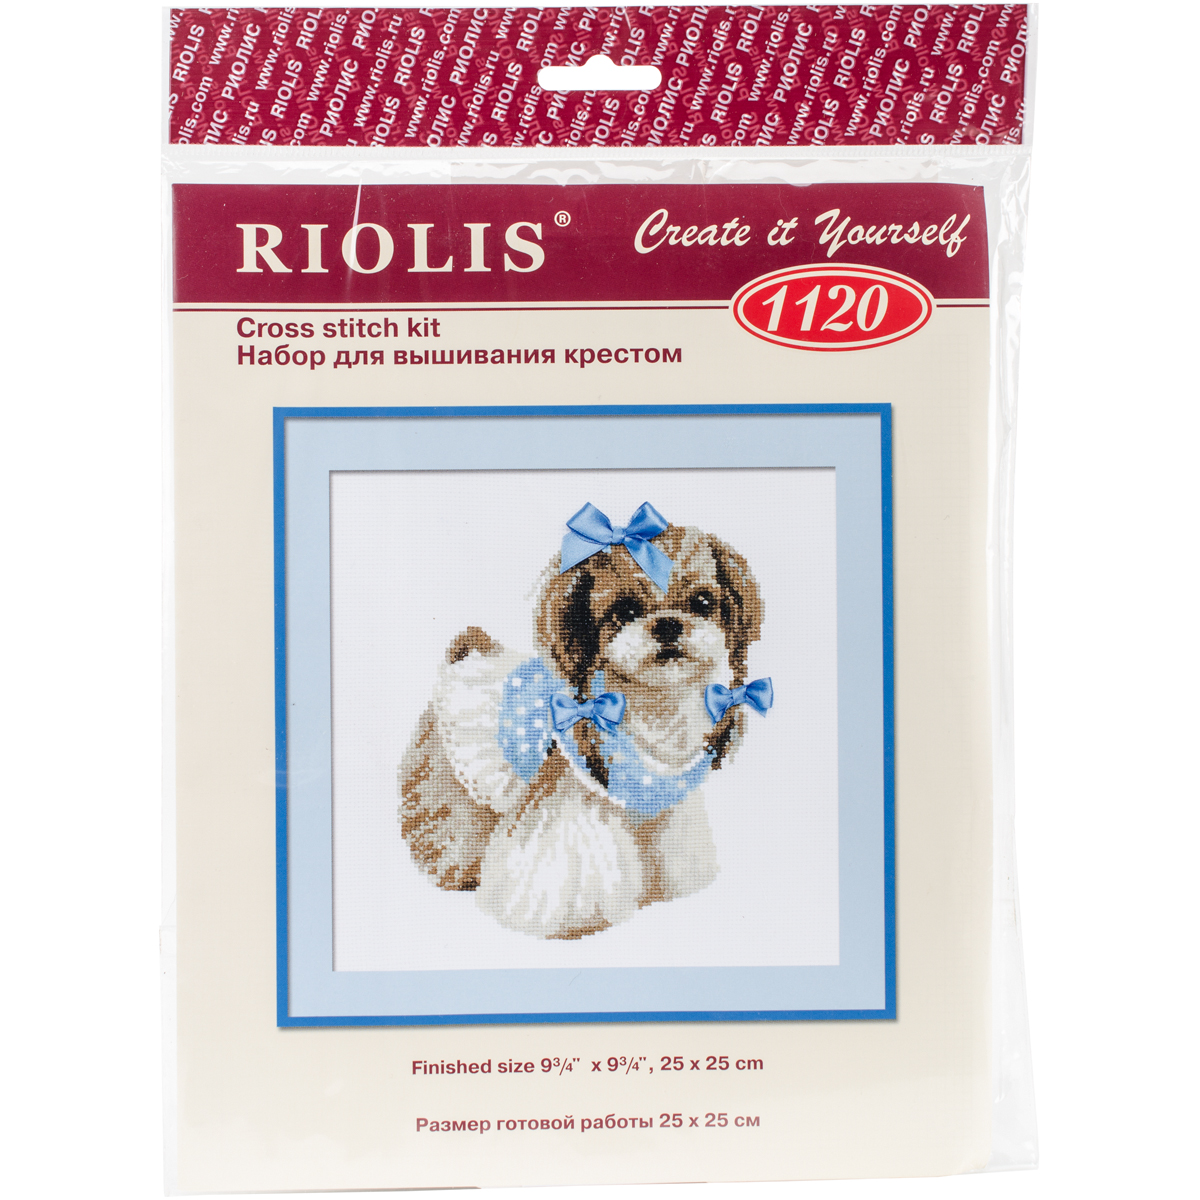 Shih Tzu Dog Cross Stitch Kit